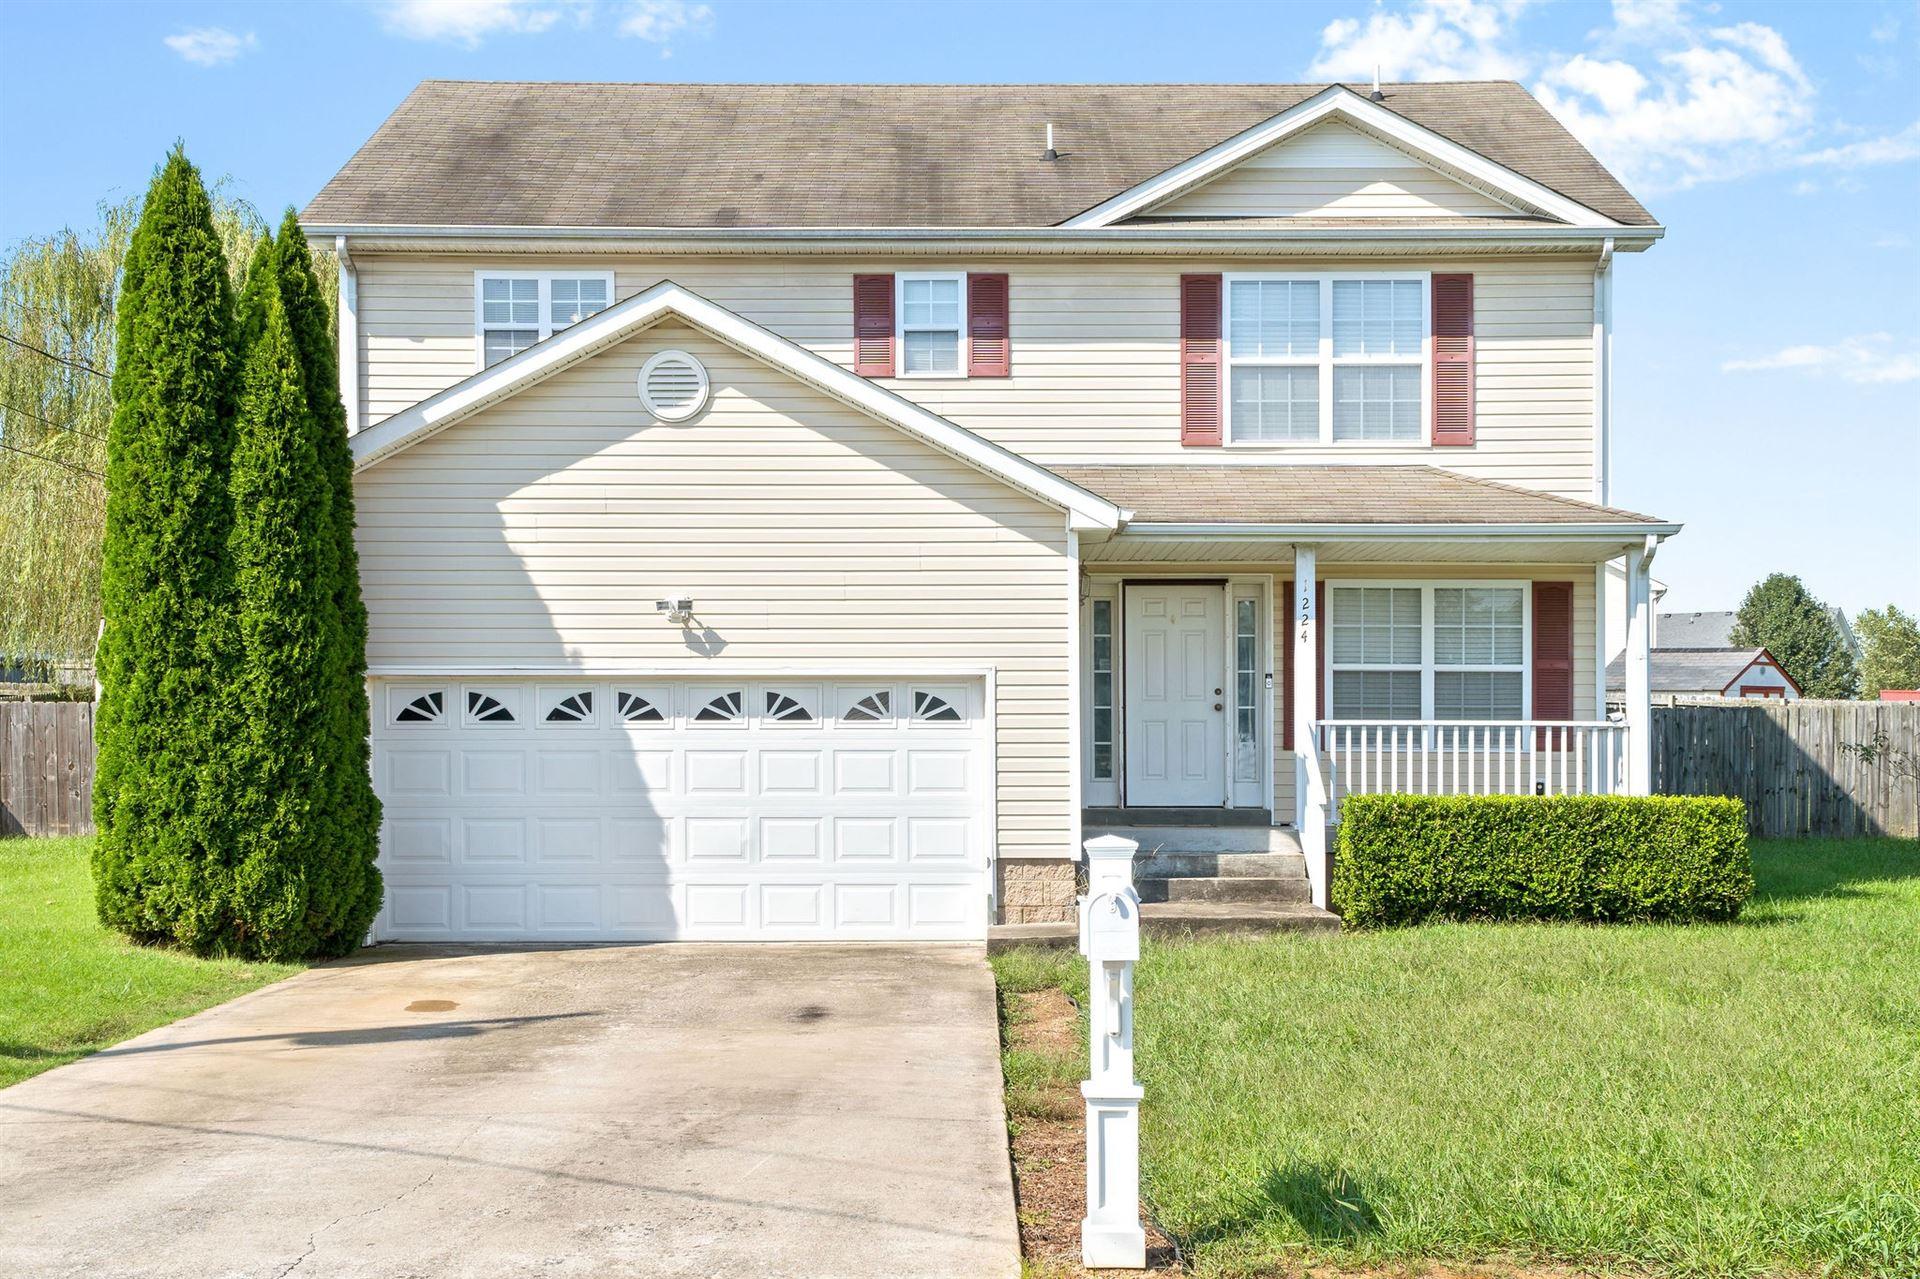 1224 Shorehaven Dr, Clarksville, TN 37042 - MLS#: 2294749